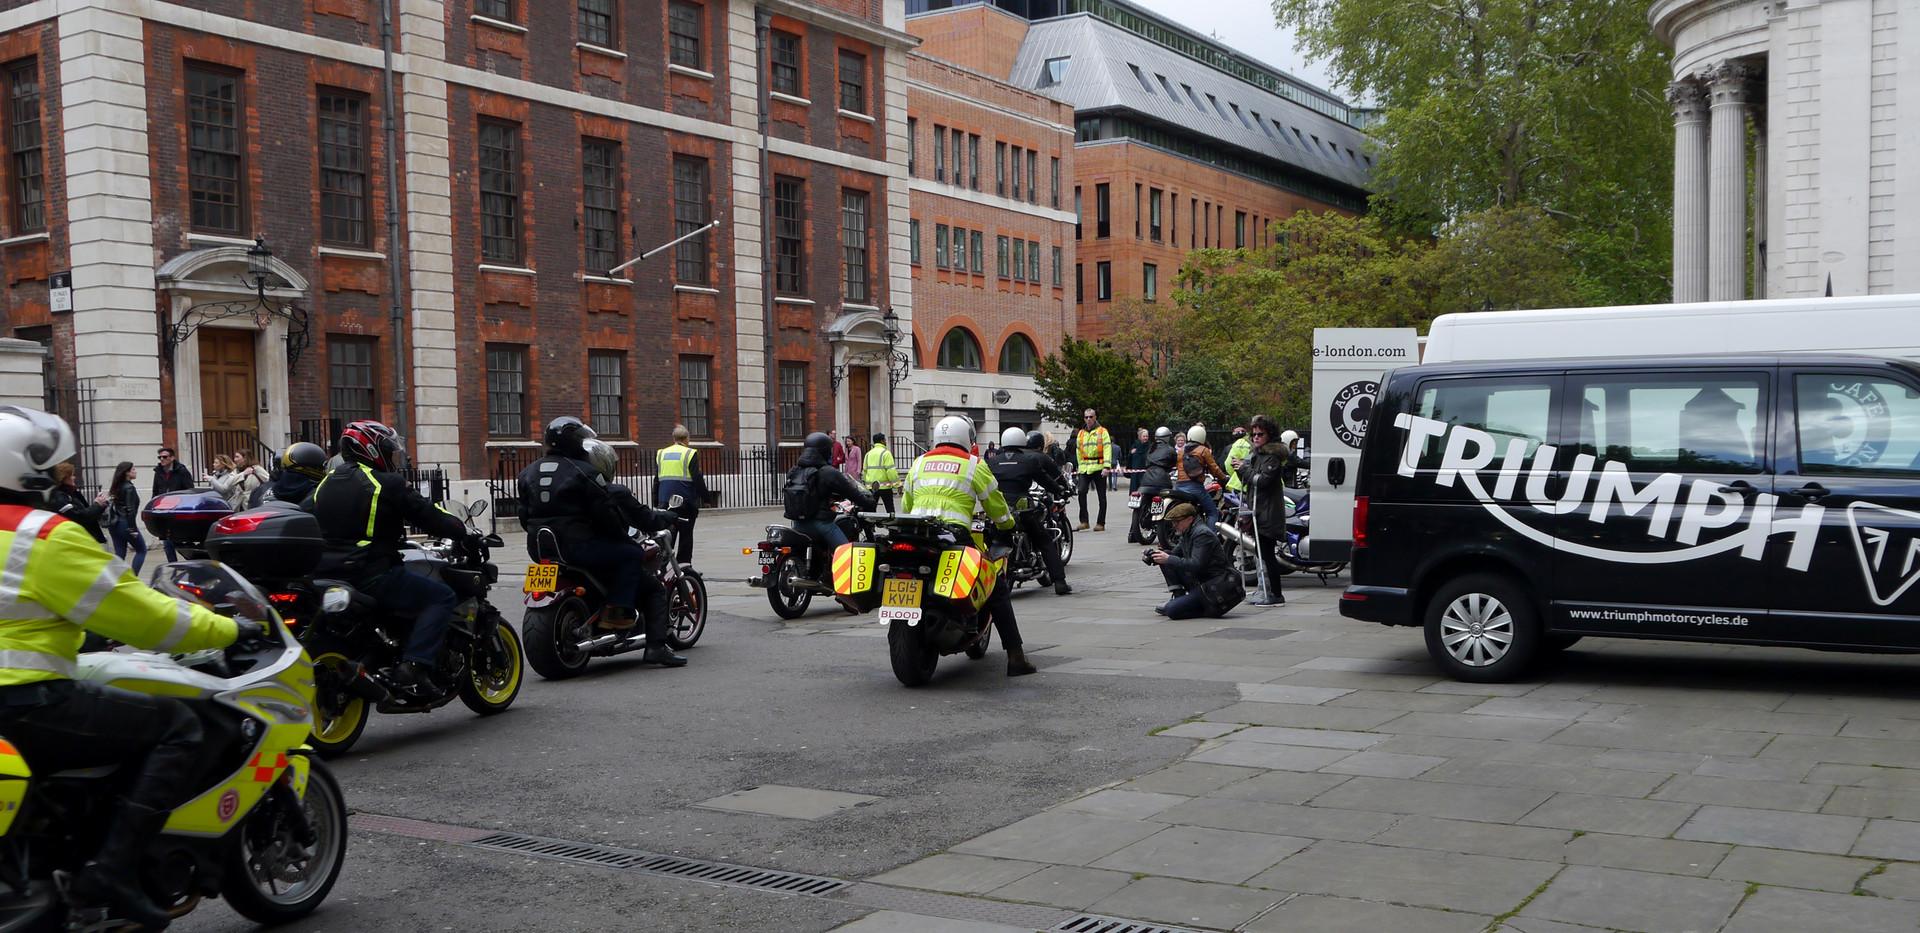 Bikes arrive at St Pauls